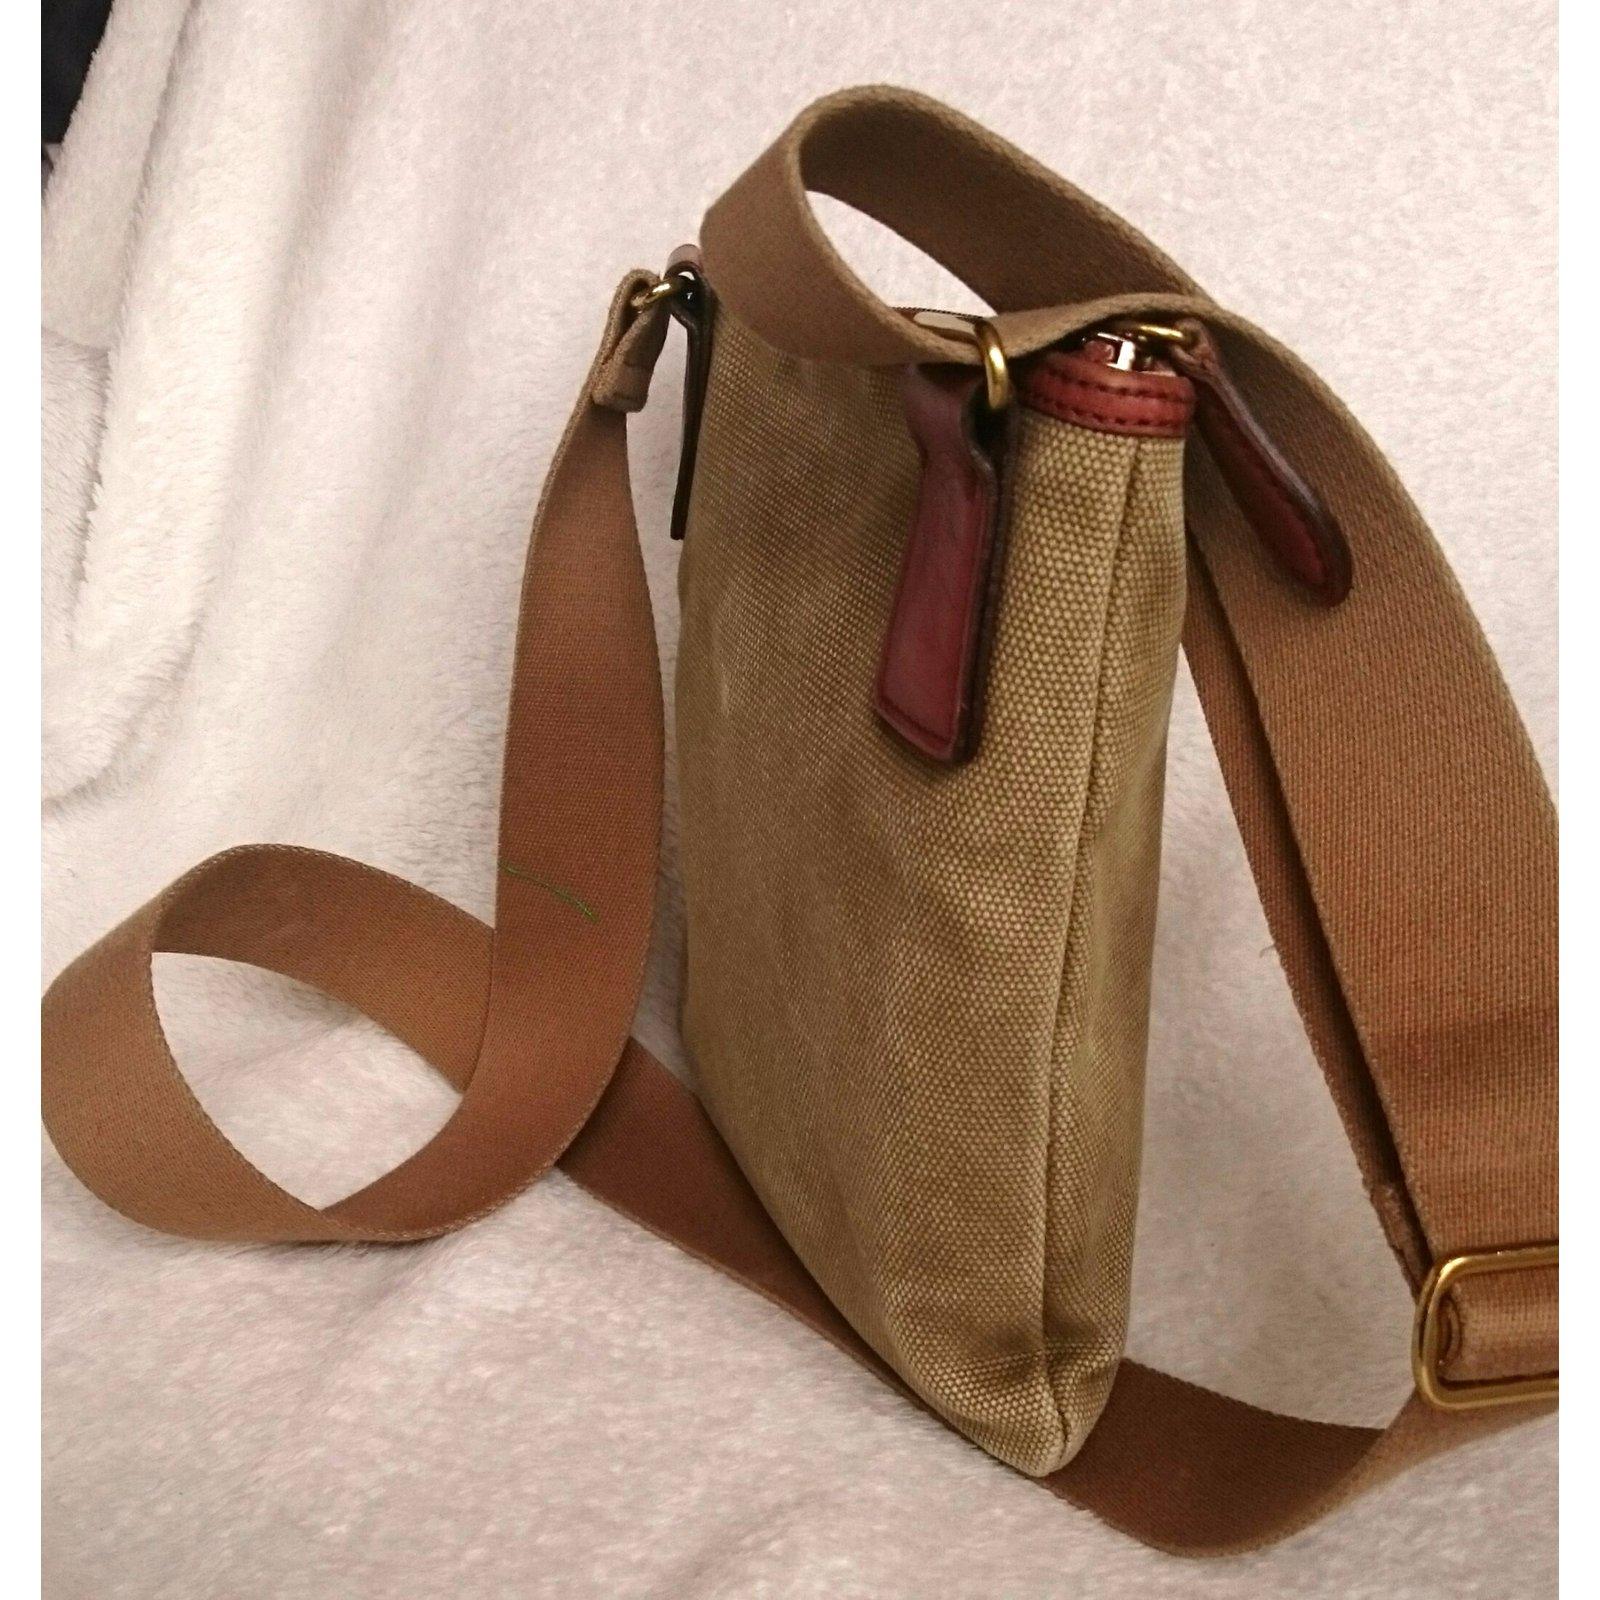 68b563763e Ralph Lauren Ralph Lauren bag Handbags Leather